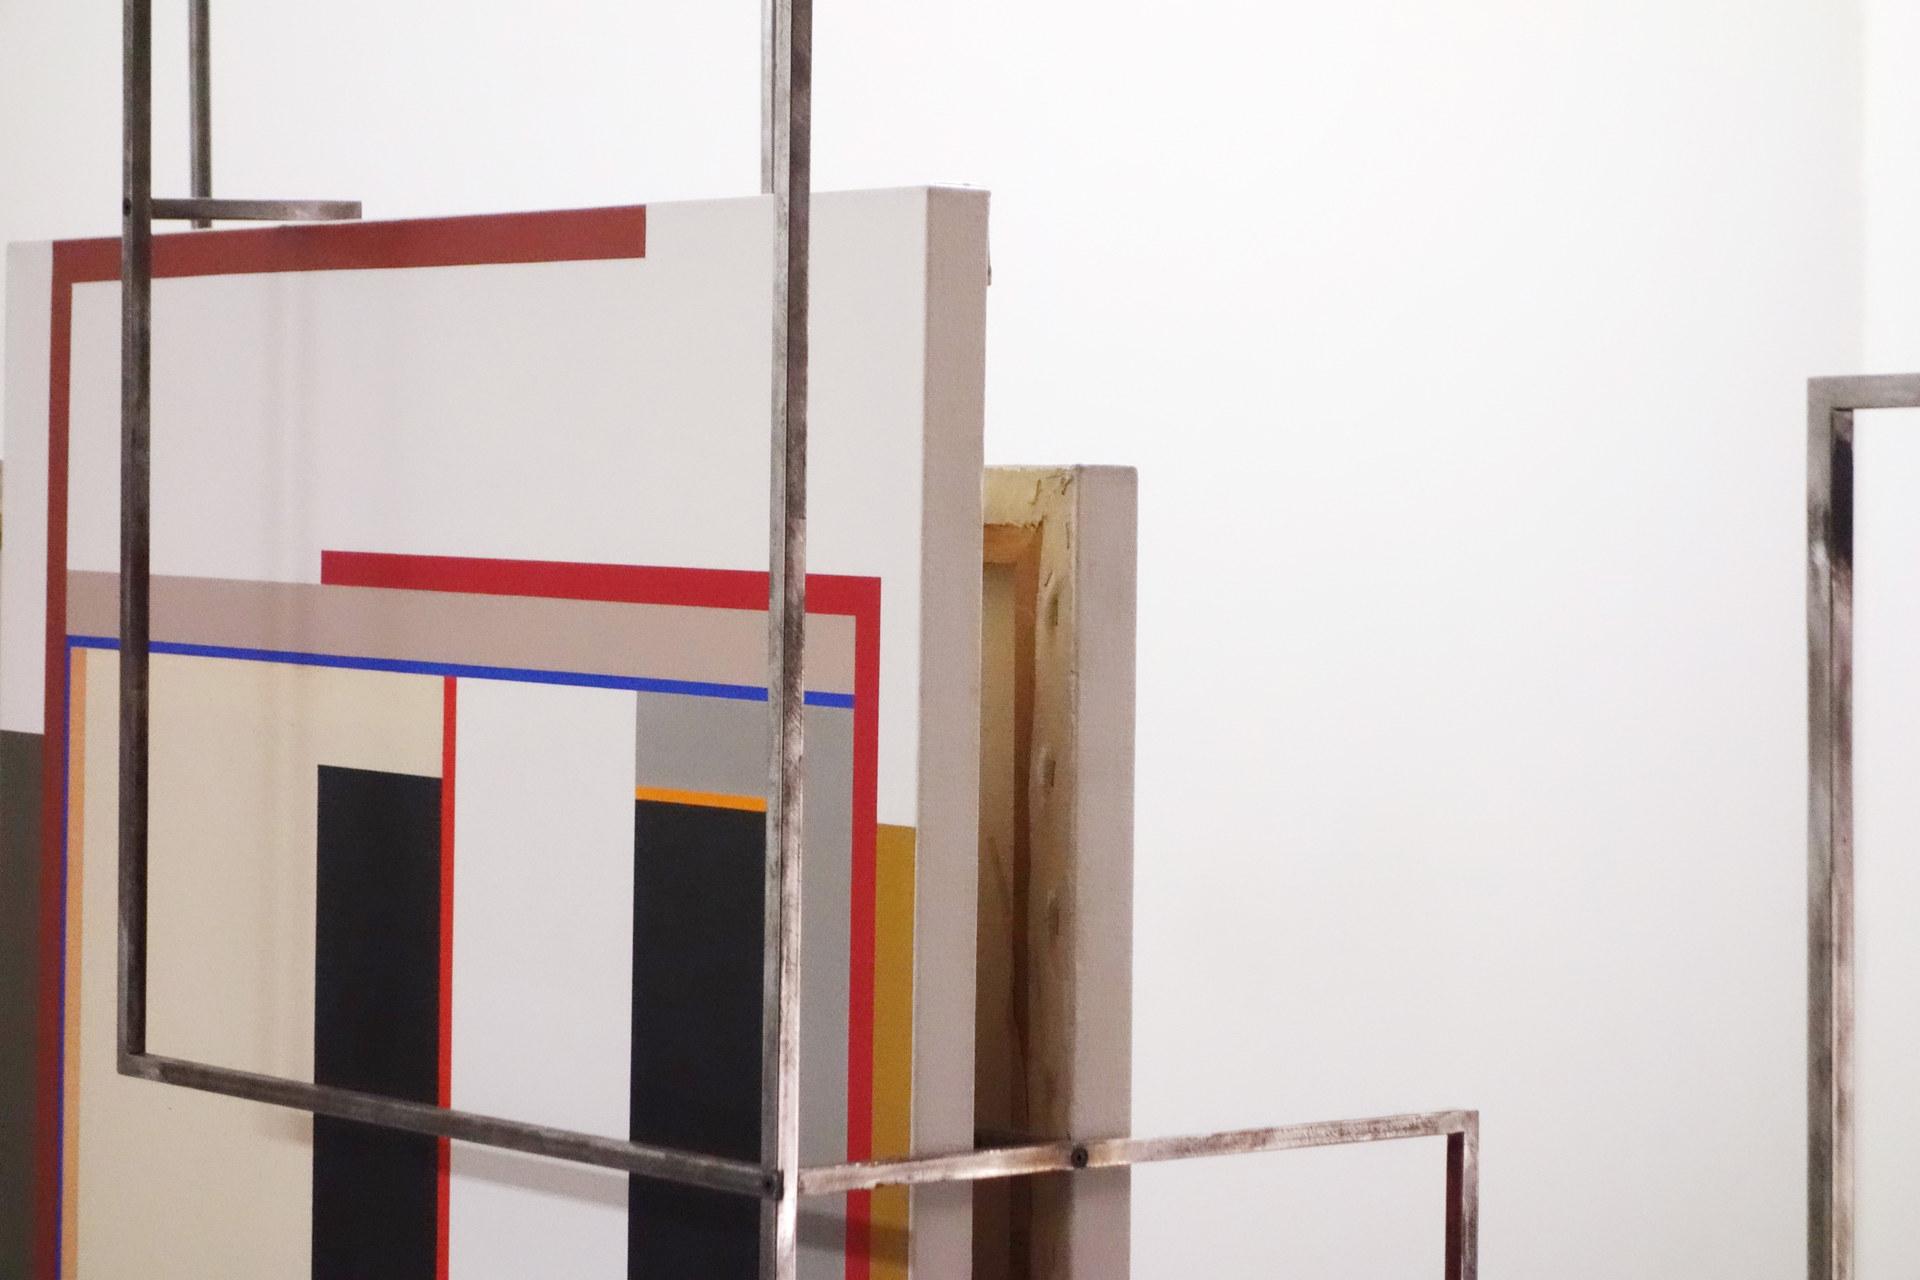 P!-Material-Cerrillo-LustigCohen-Martens_07